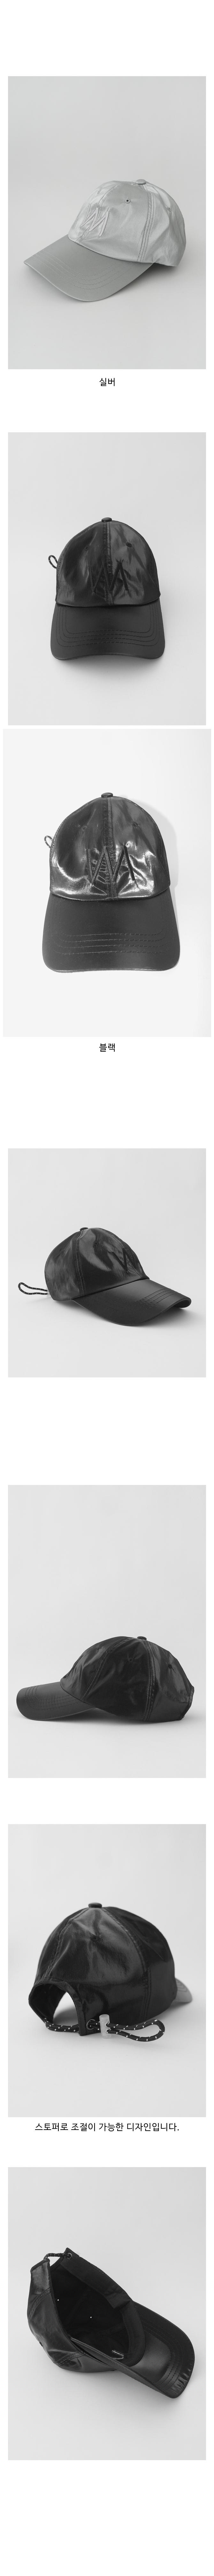 luster ball cap